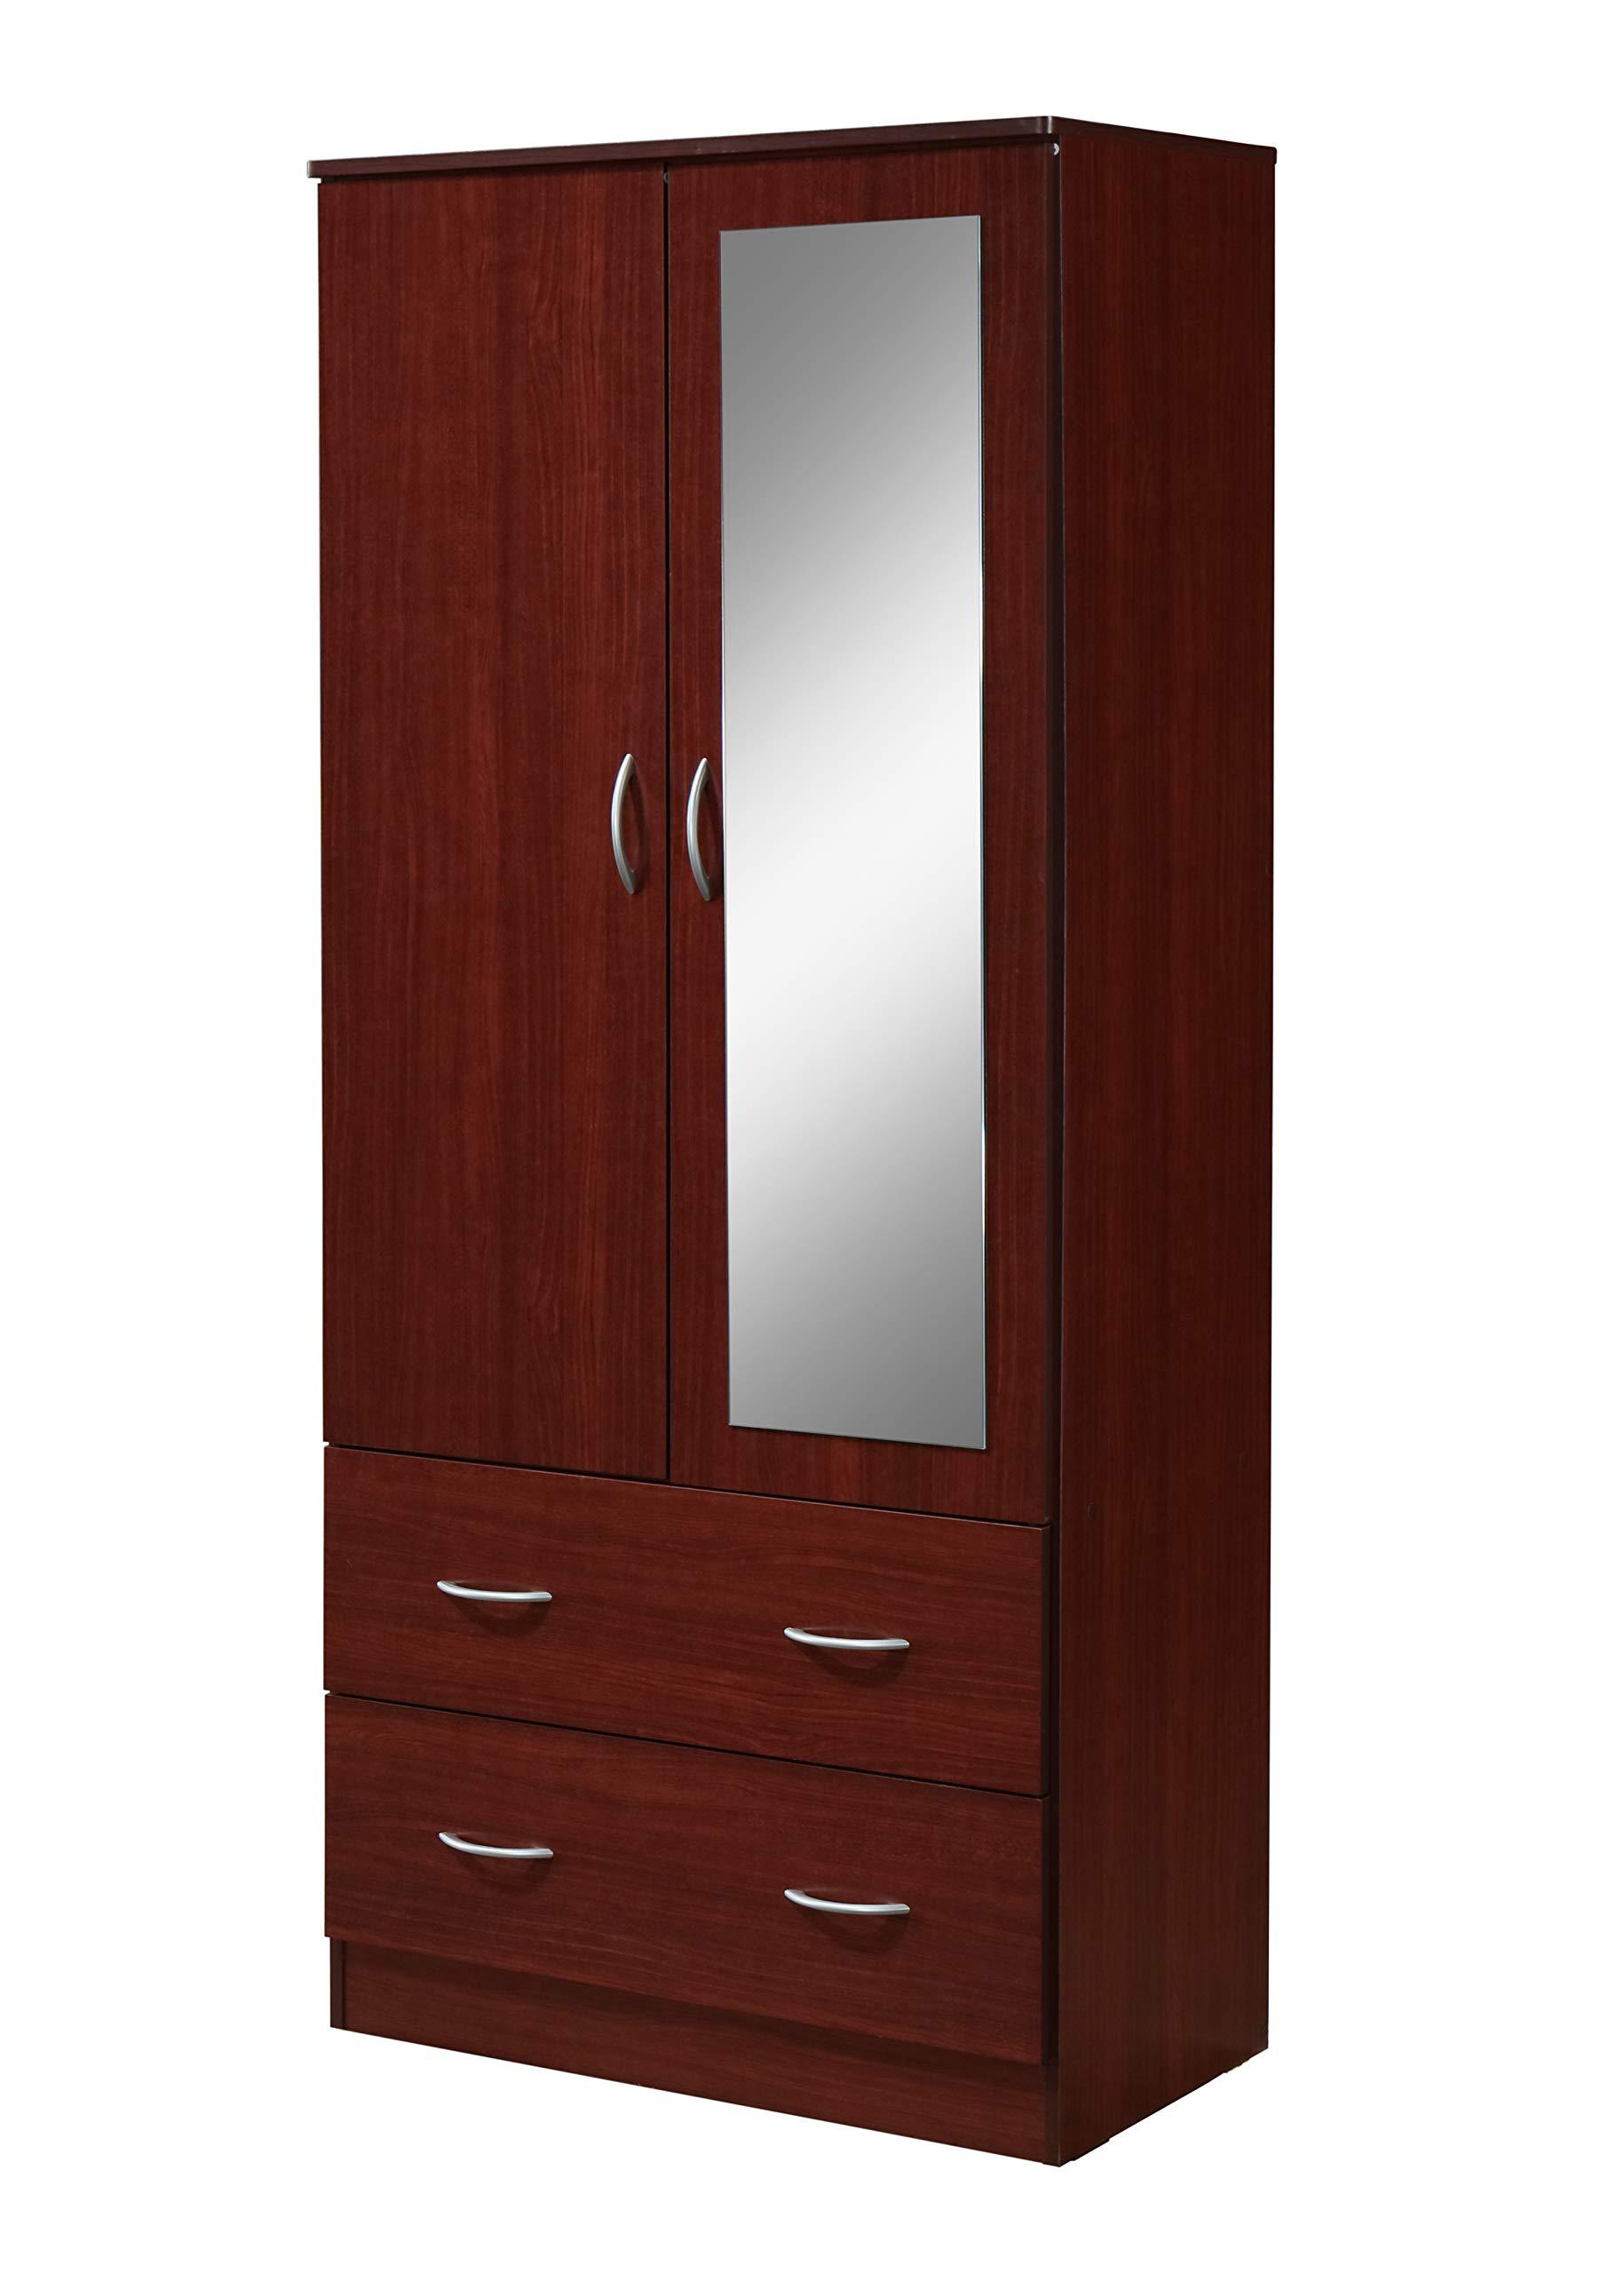 Hodedah HI882 Door 2-Drawers, Mirror and Clothing Rod in Mahogany Armoire,